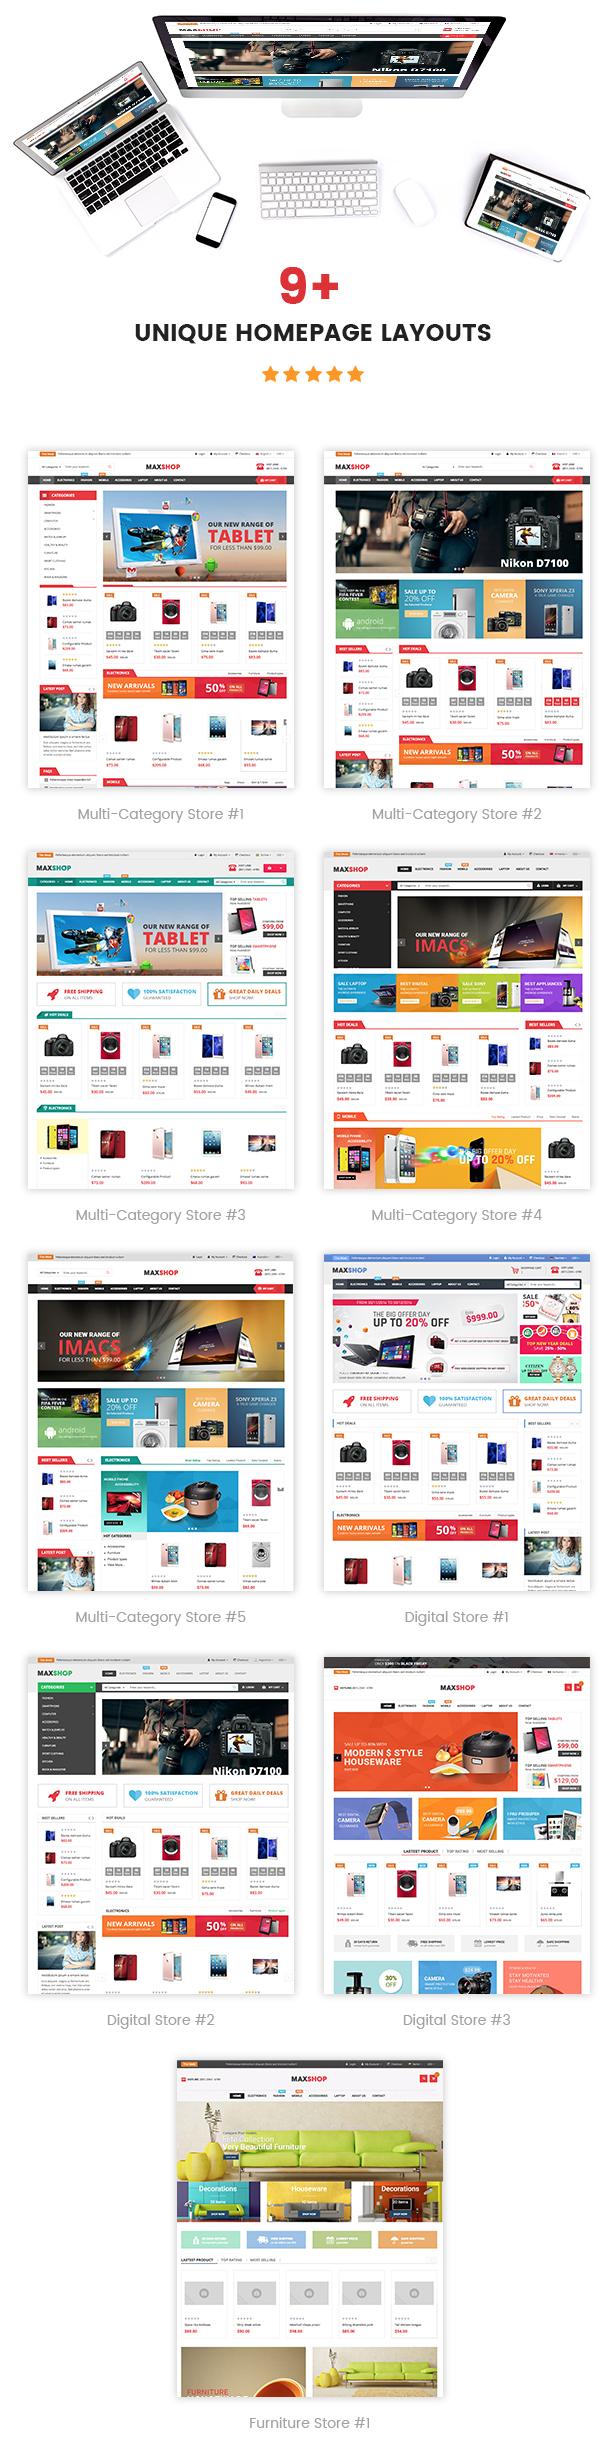 Maxshop - Homepage Styles